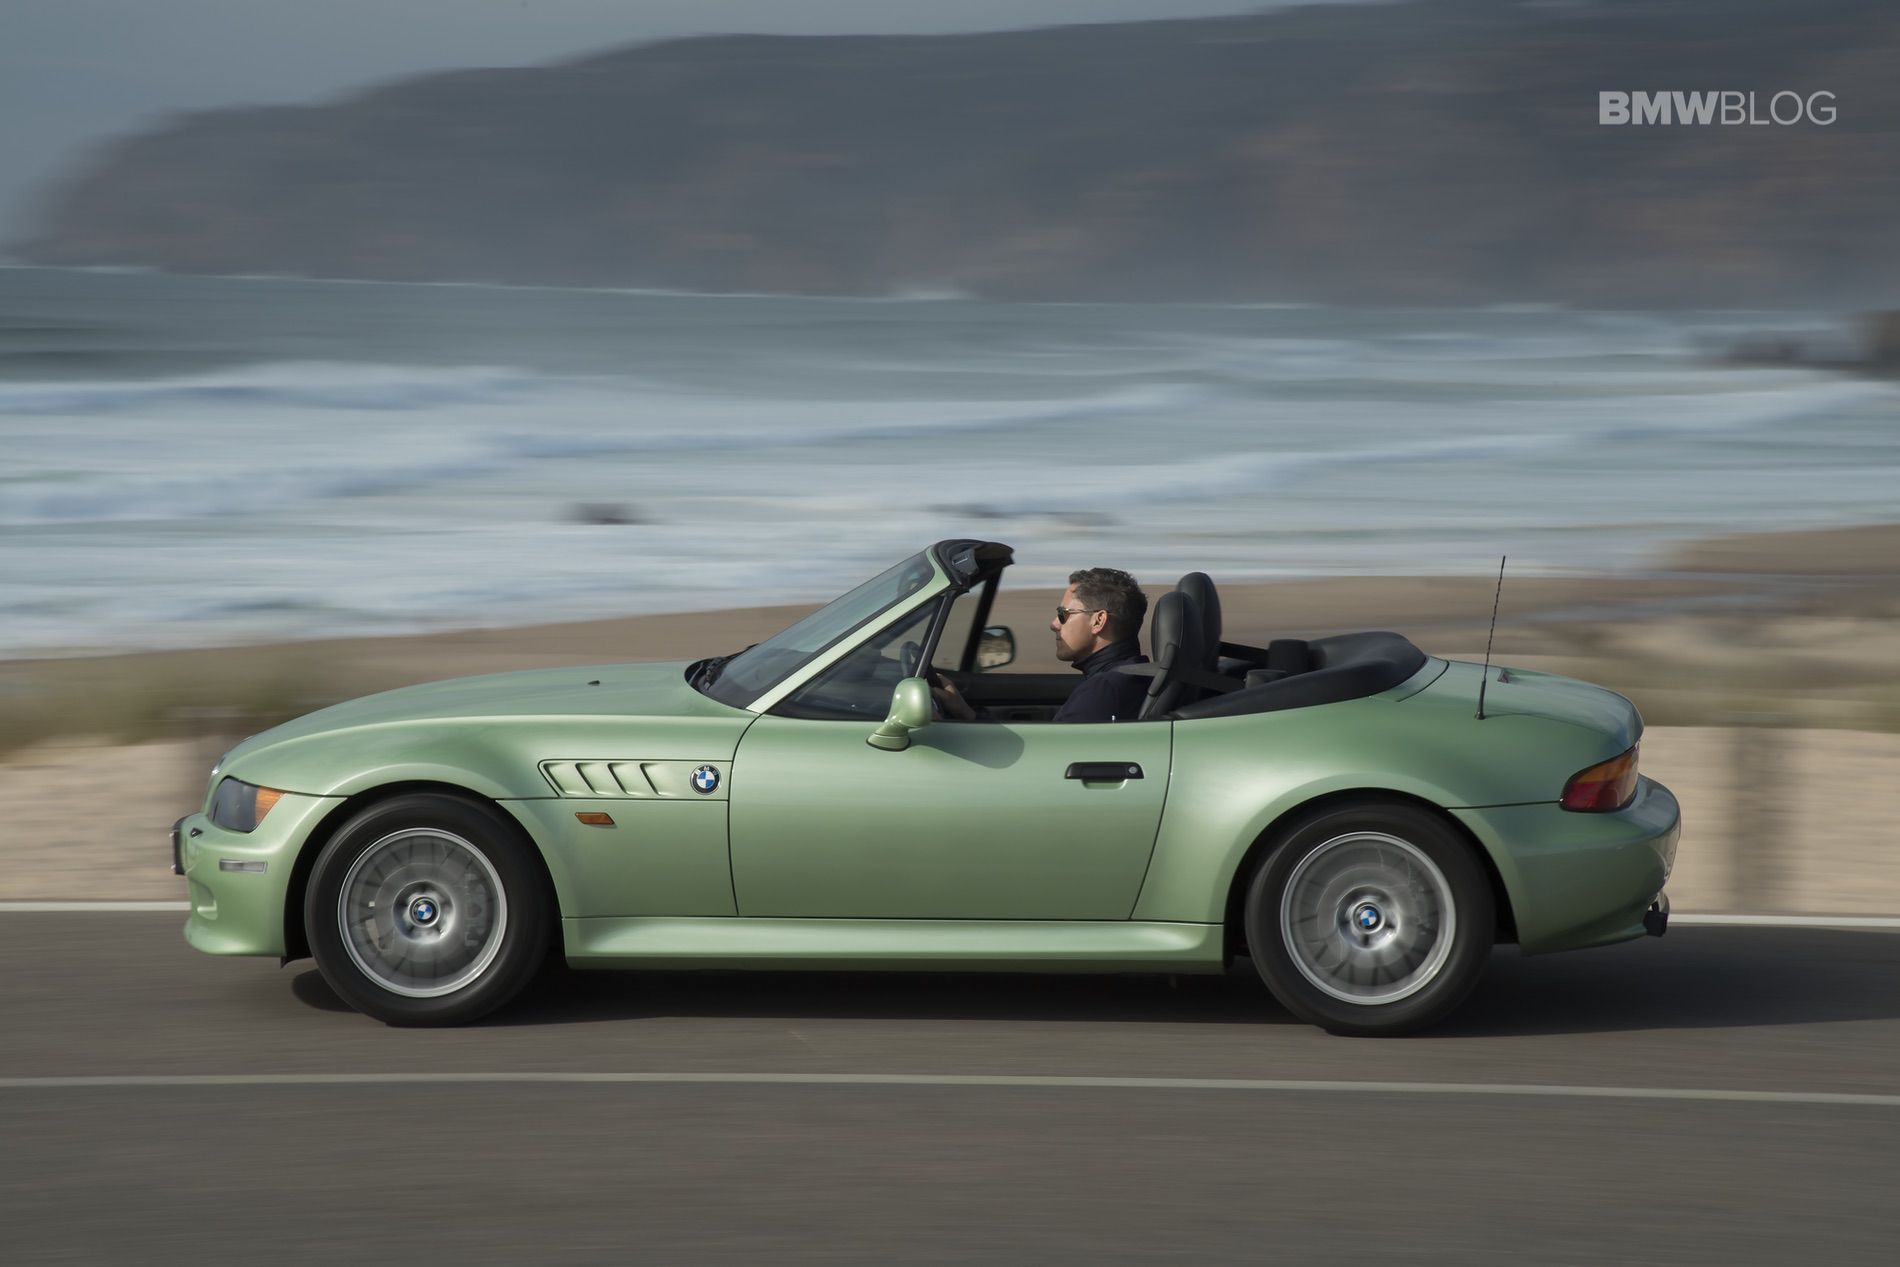 Bmw Z3 Roadster In Palmetto Green Cars Automobiles